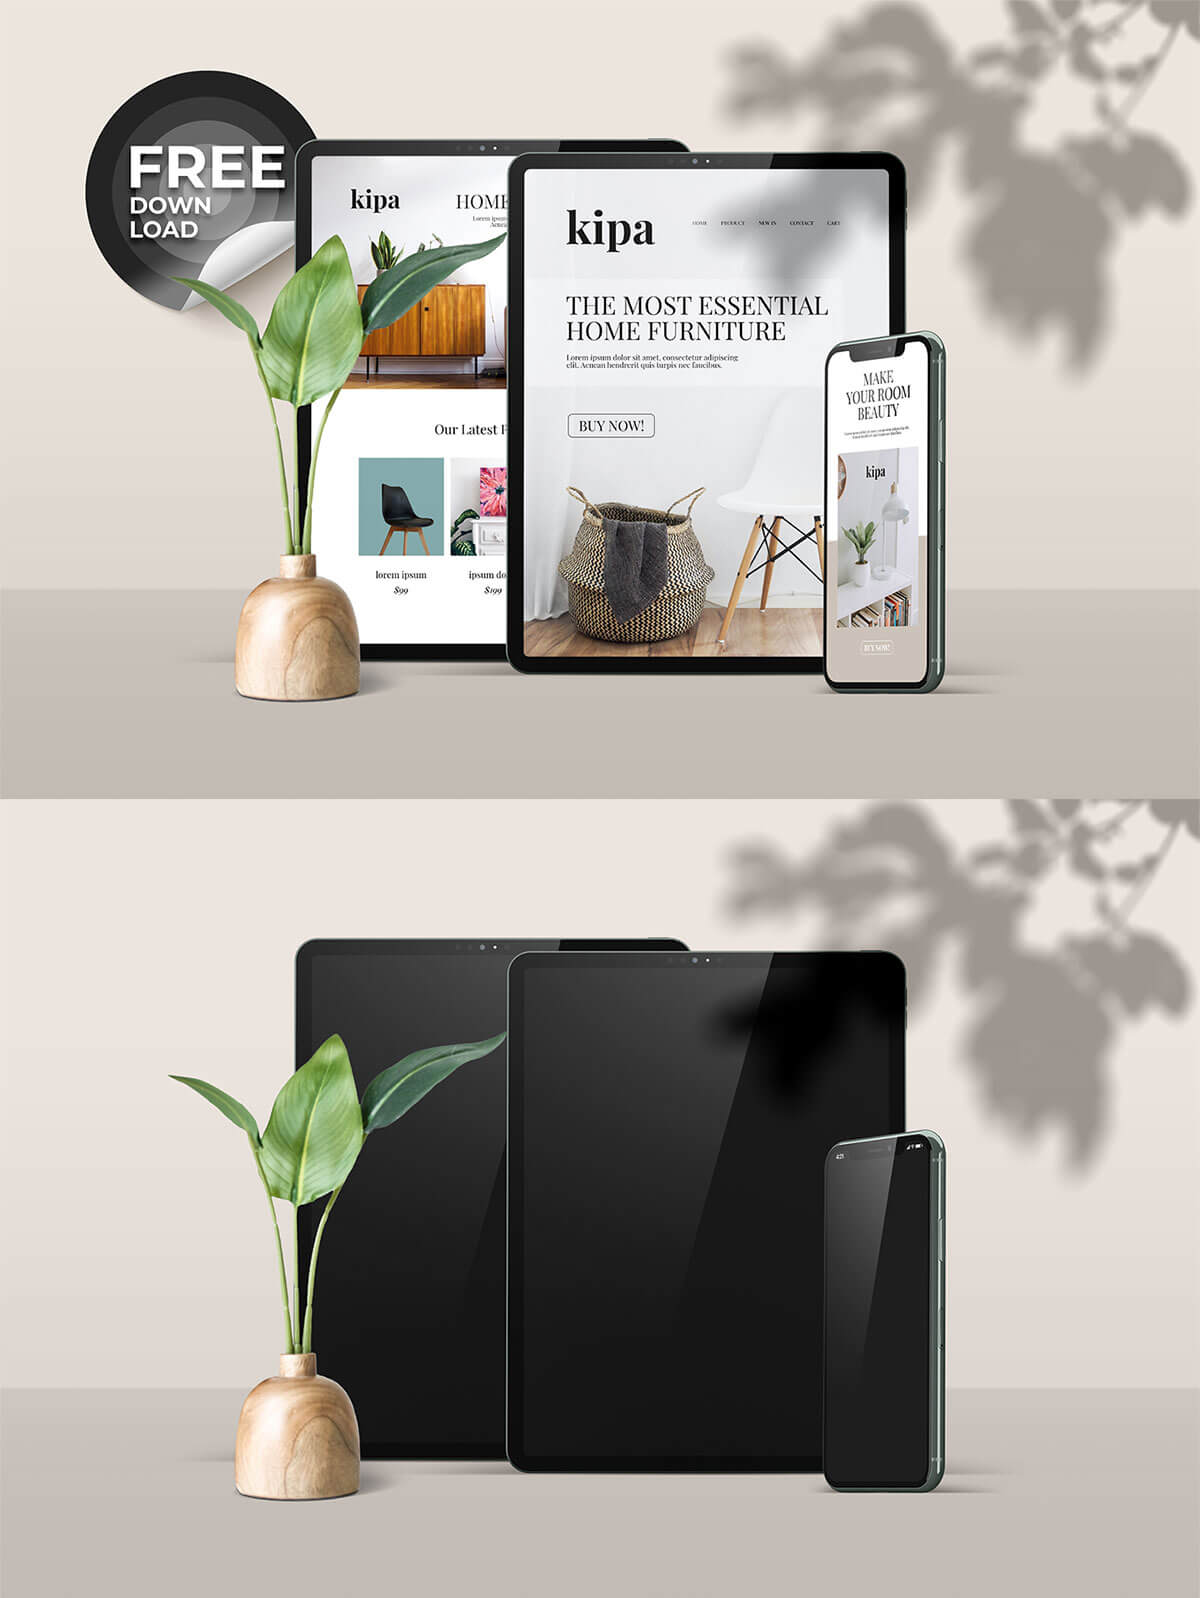 Free iPhone & iPad Mockup